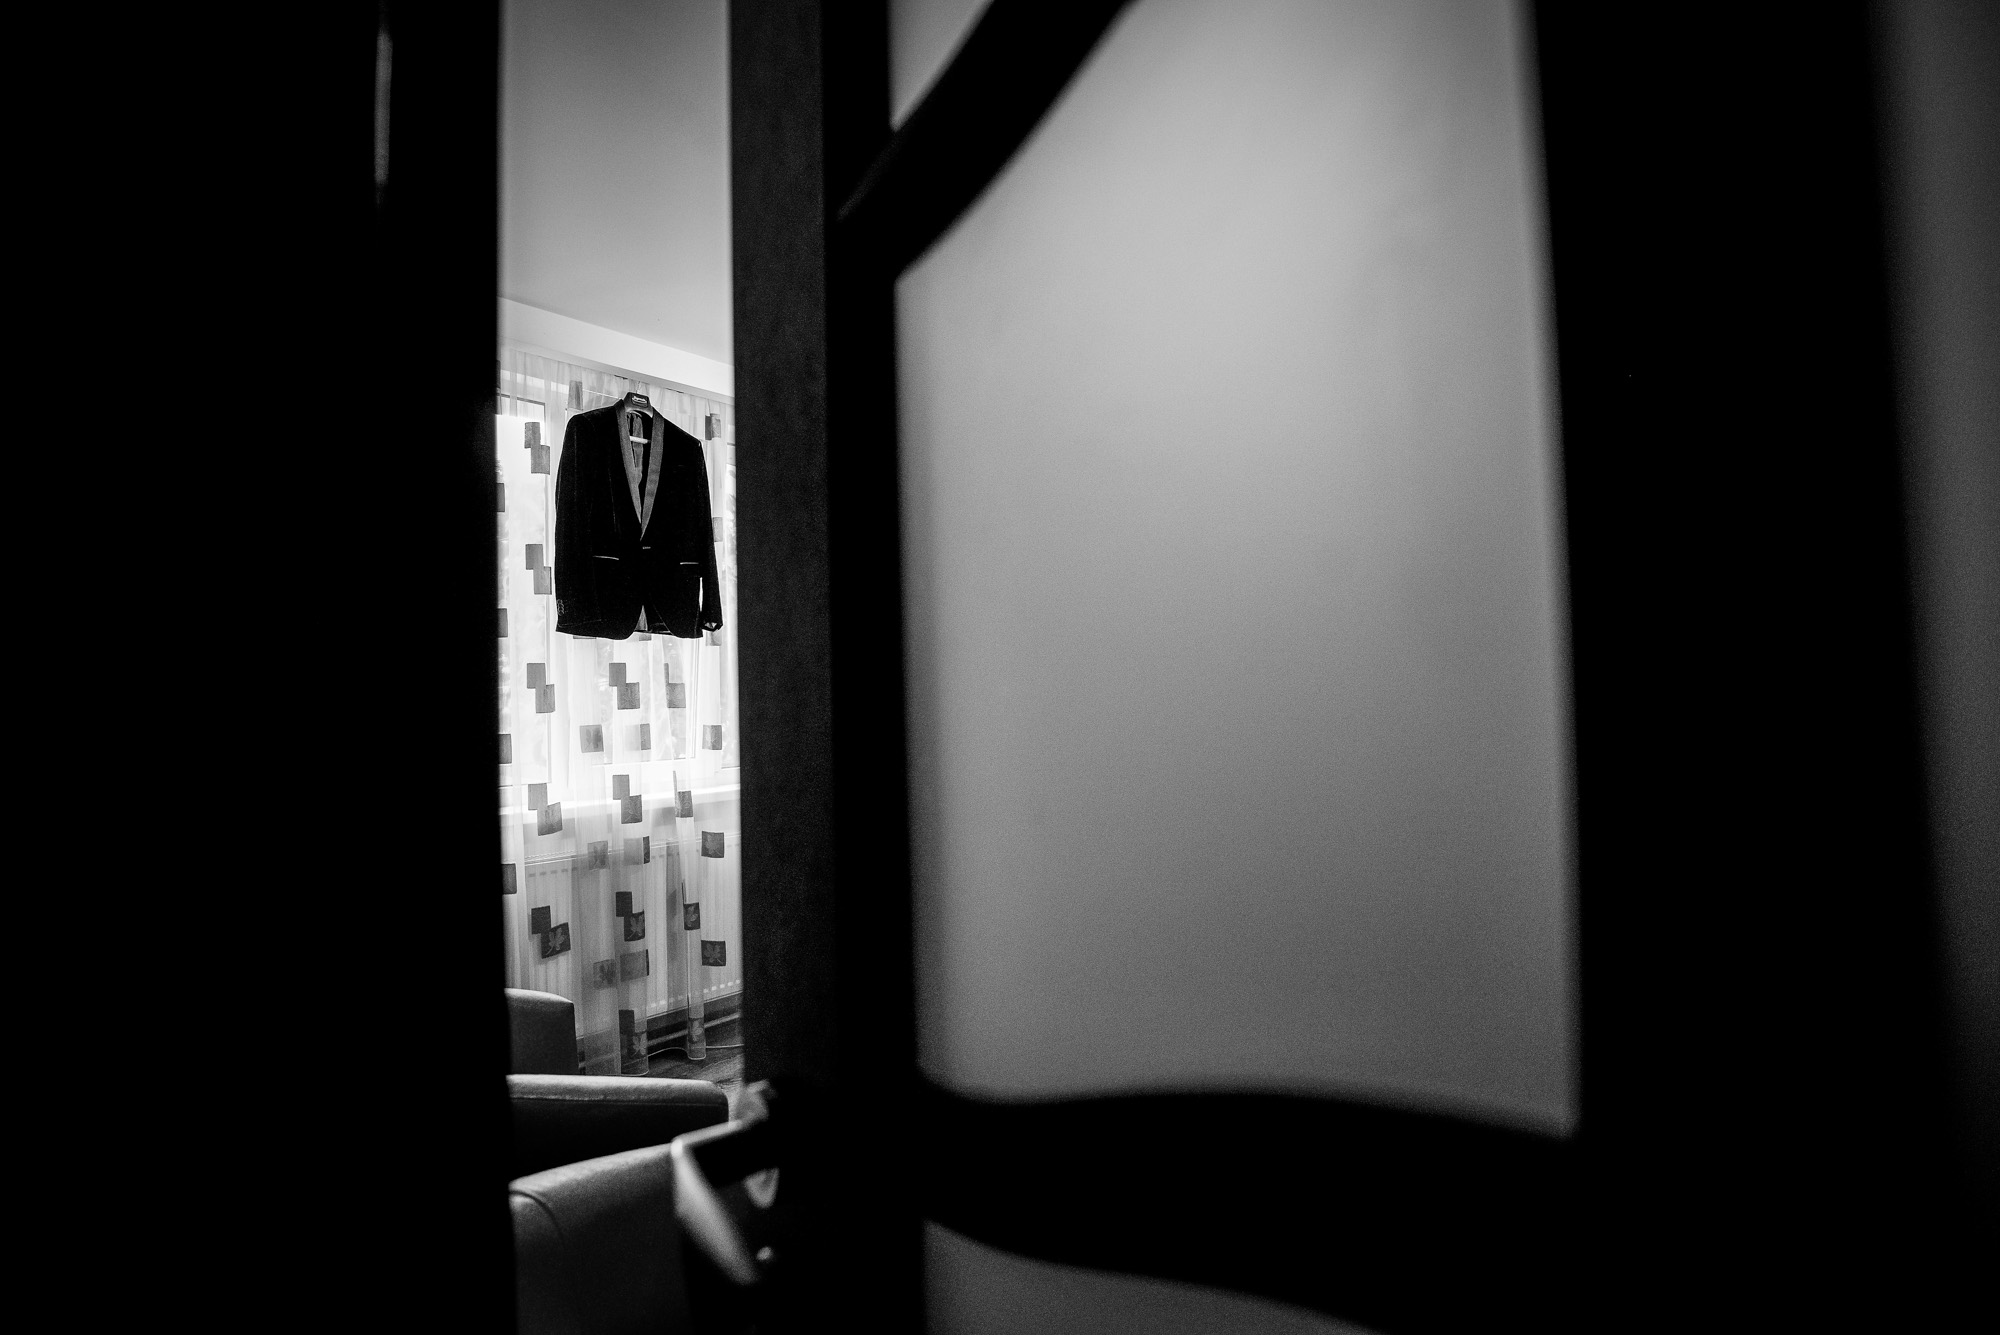 fotograf nunta bacau, fotograf nunta piatra neamt, fotograf suceava, fotograf bacau, fotograf piatra neamt, fotograf iasi, fotograf onesti, foto video bacau, filmari bacau, foto video iasi, fotograf nunta suceava, fotograf piatra neamt, sedinta foto miclauseni, trash the dress castelul sturza, nunta piatra neamt